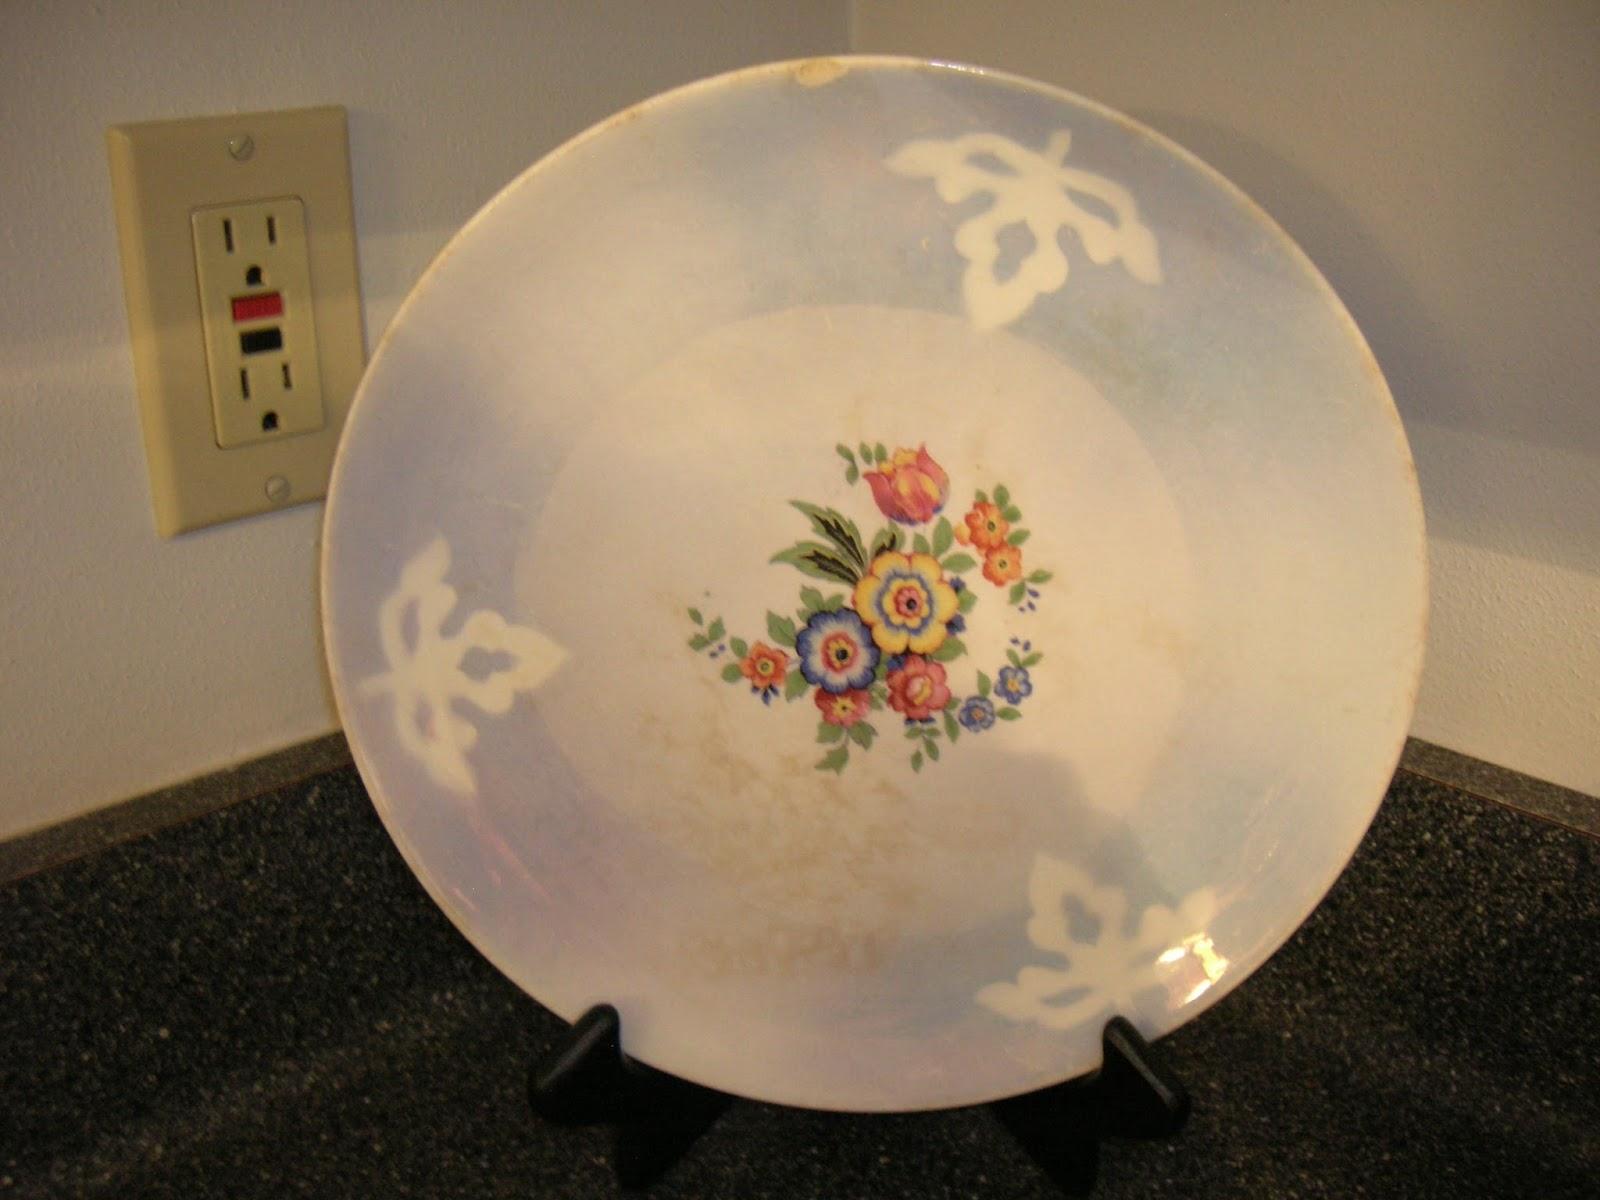 Maison Newton: Old Plate: I Found the Mark!